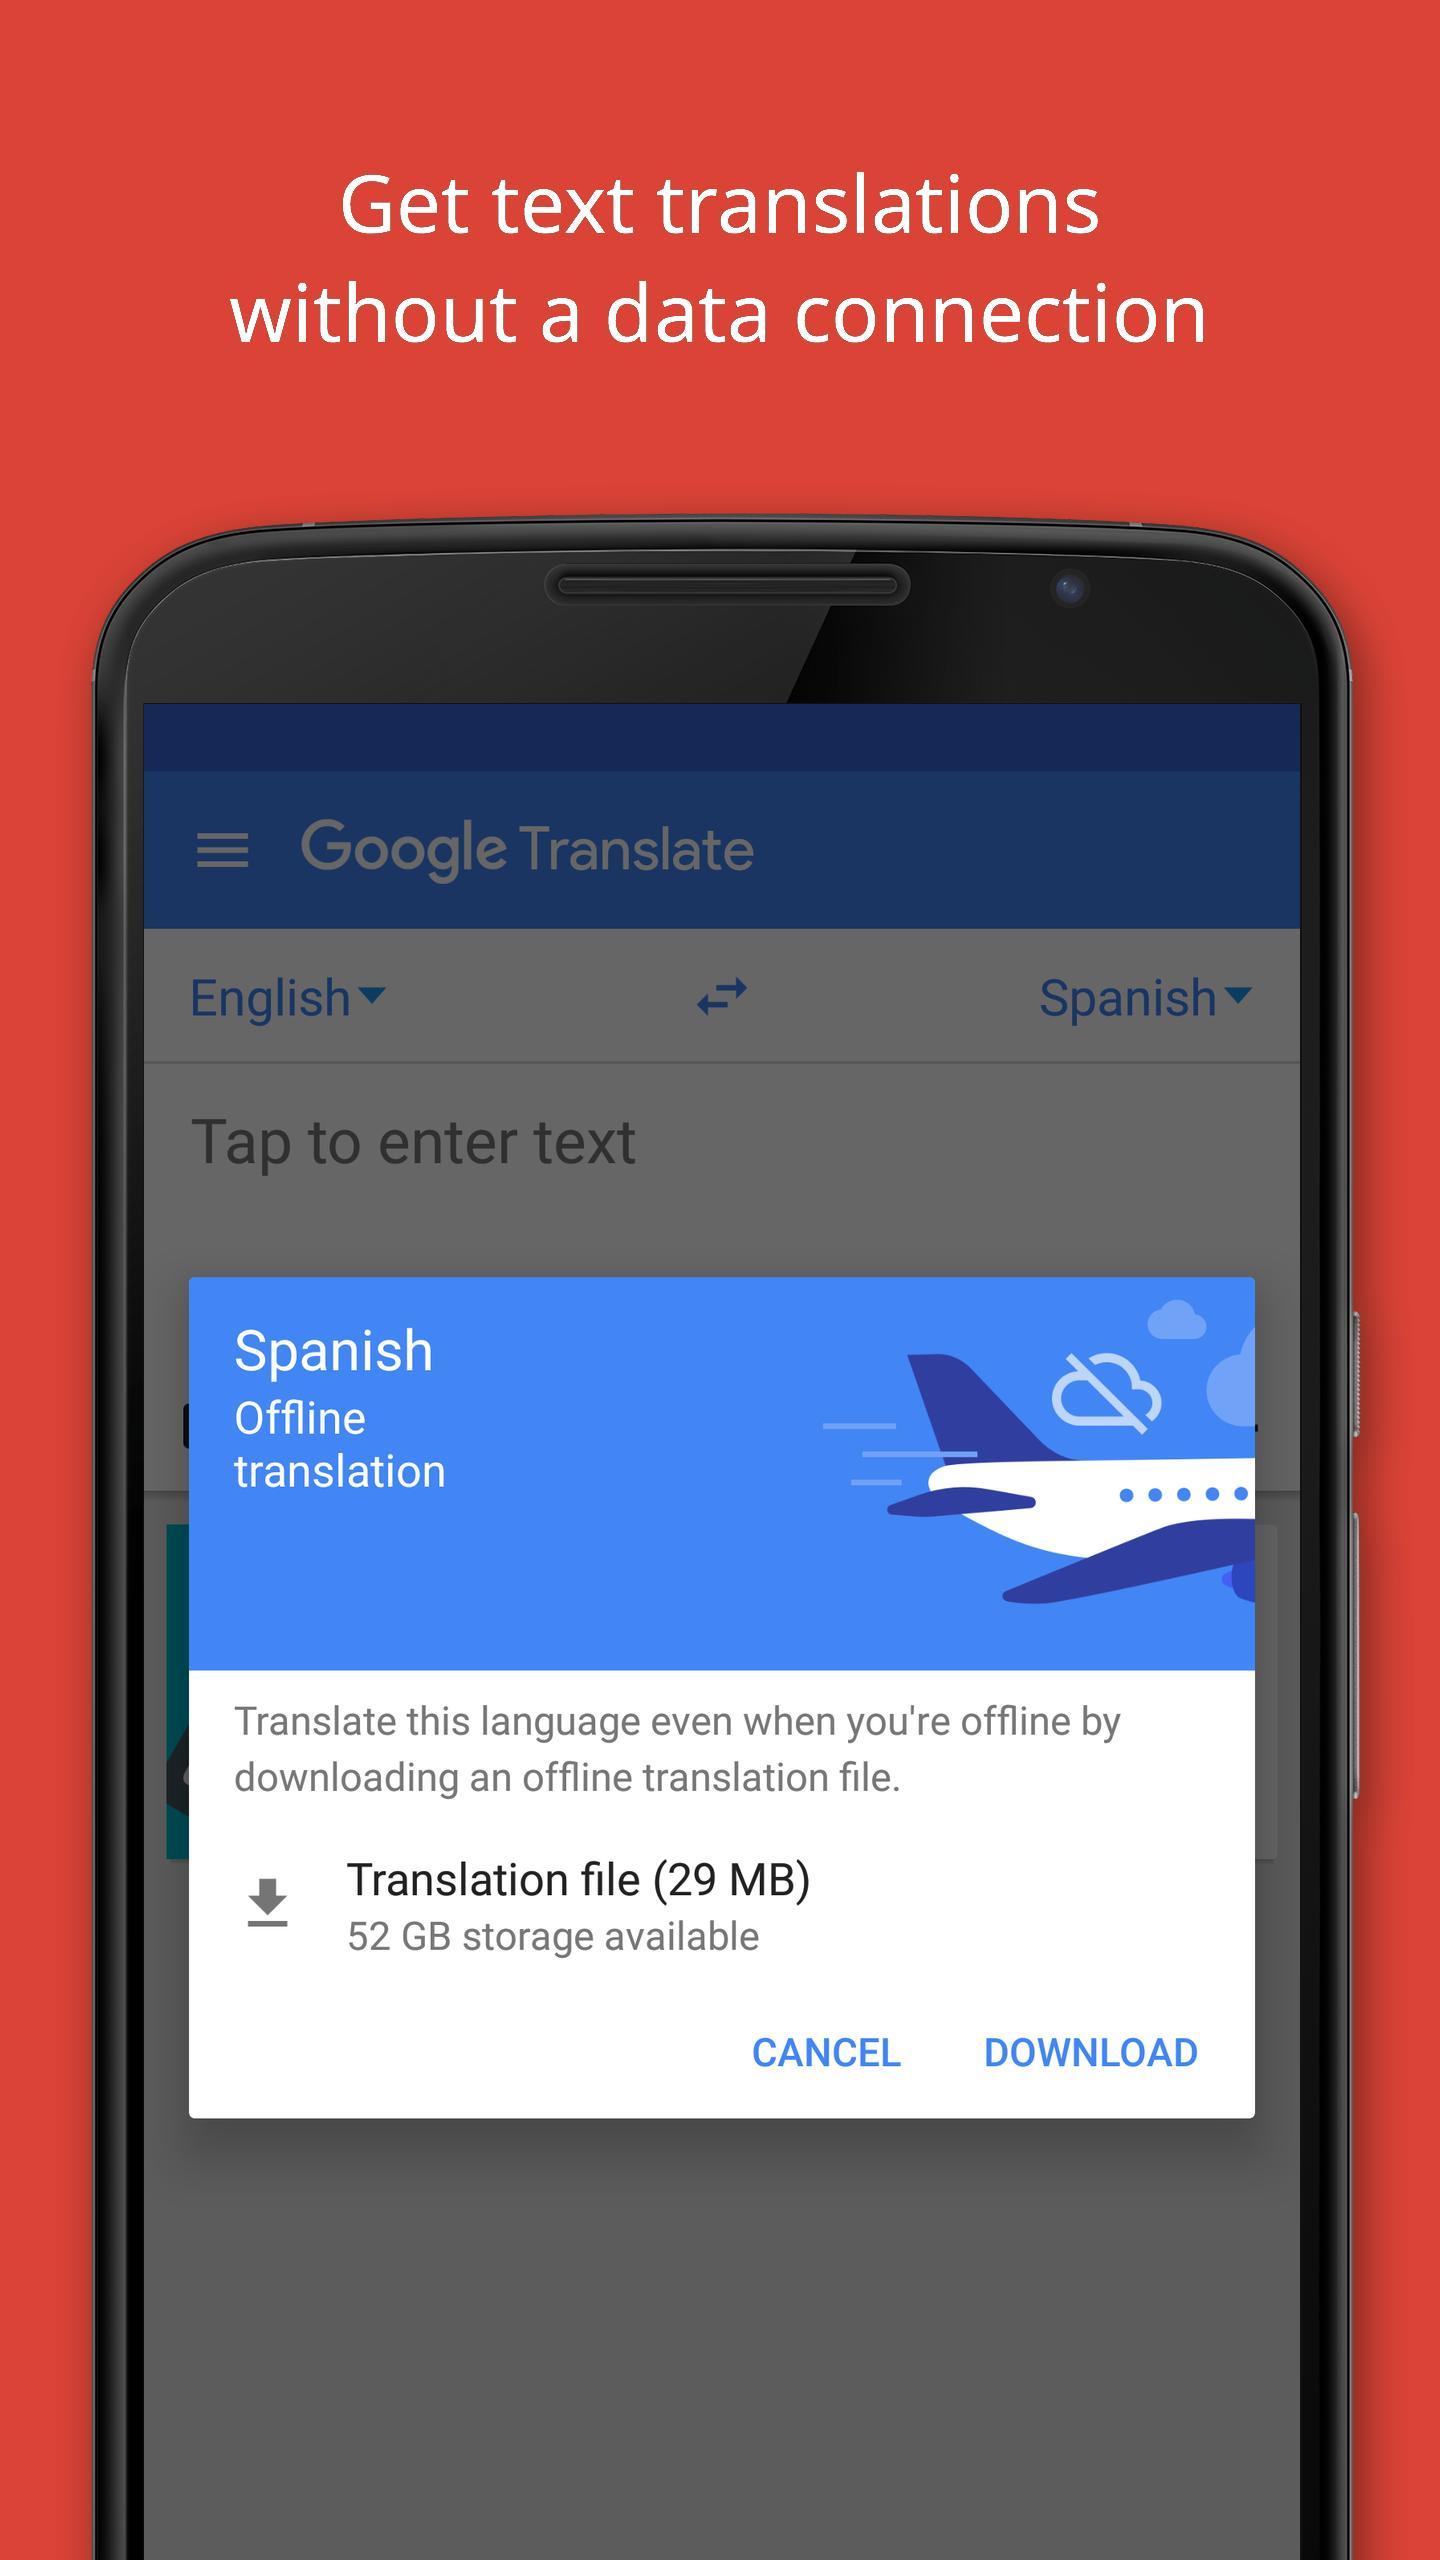 Google Translate 6.14.0.03.342186690 Screenshot 3